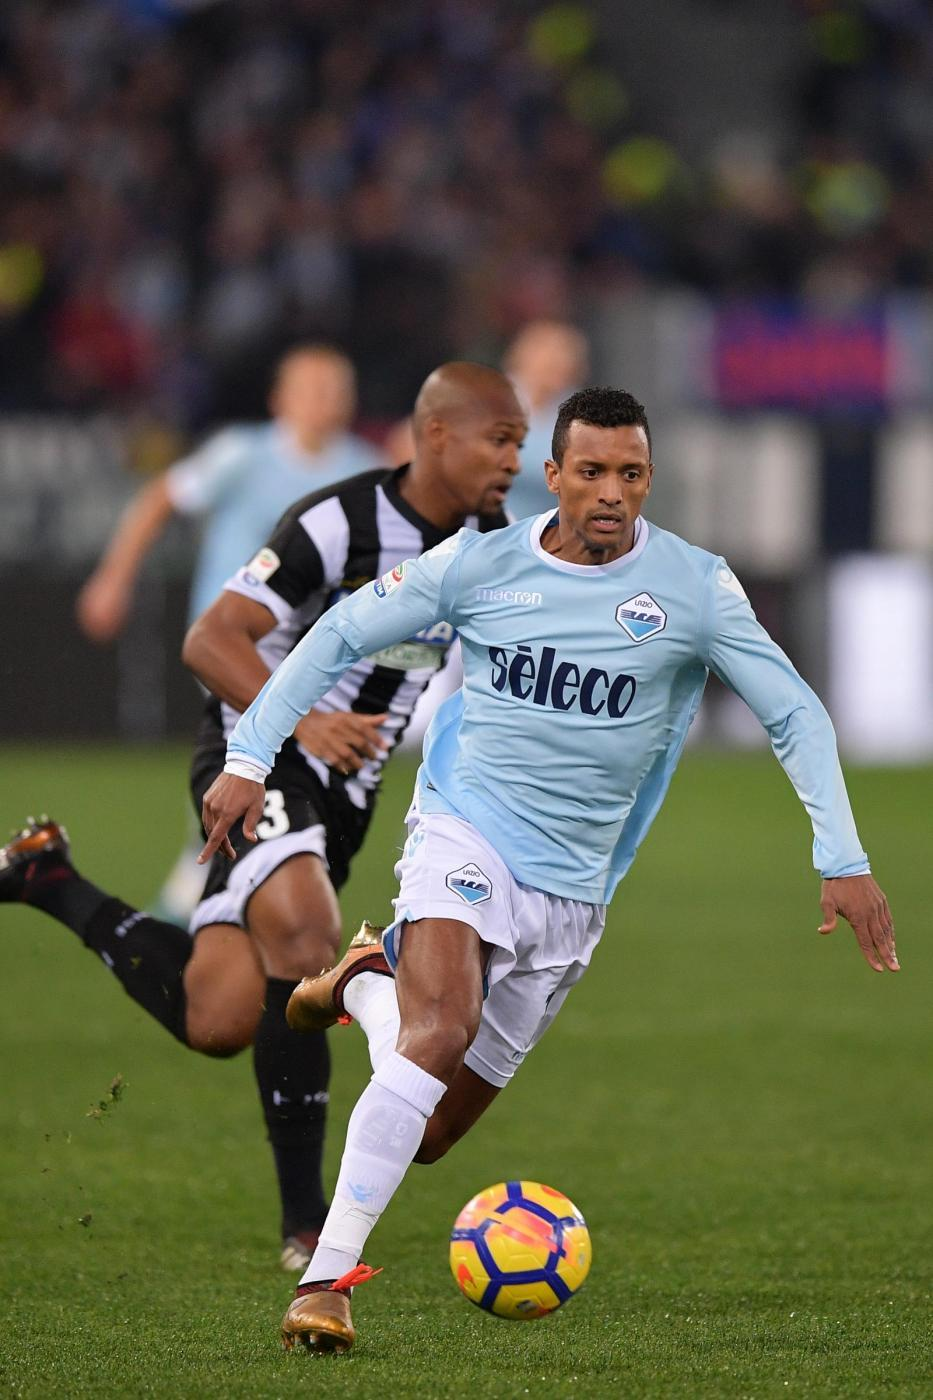 Serie A: la Lazio batte l'Udinese ed è 3a da sola